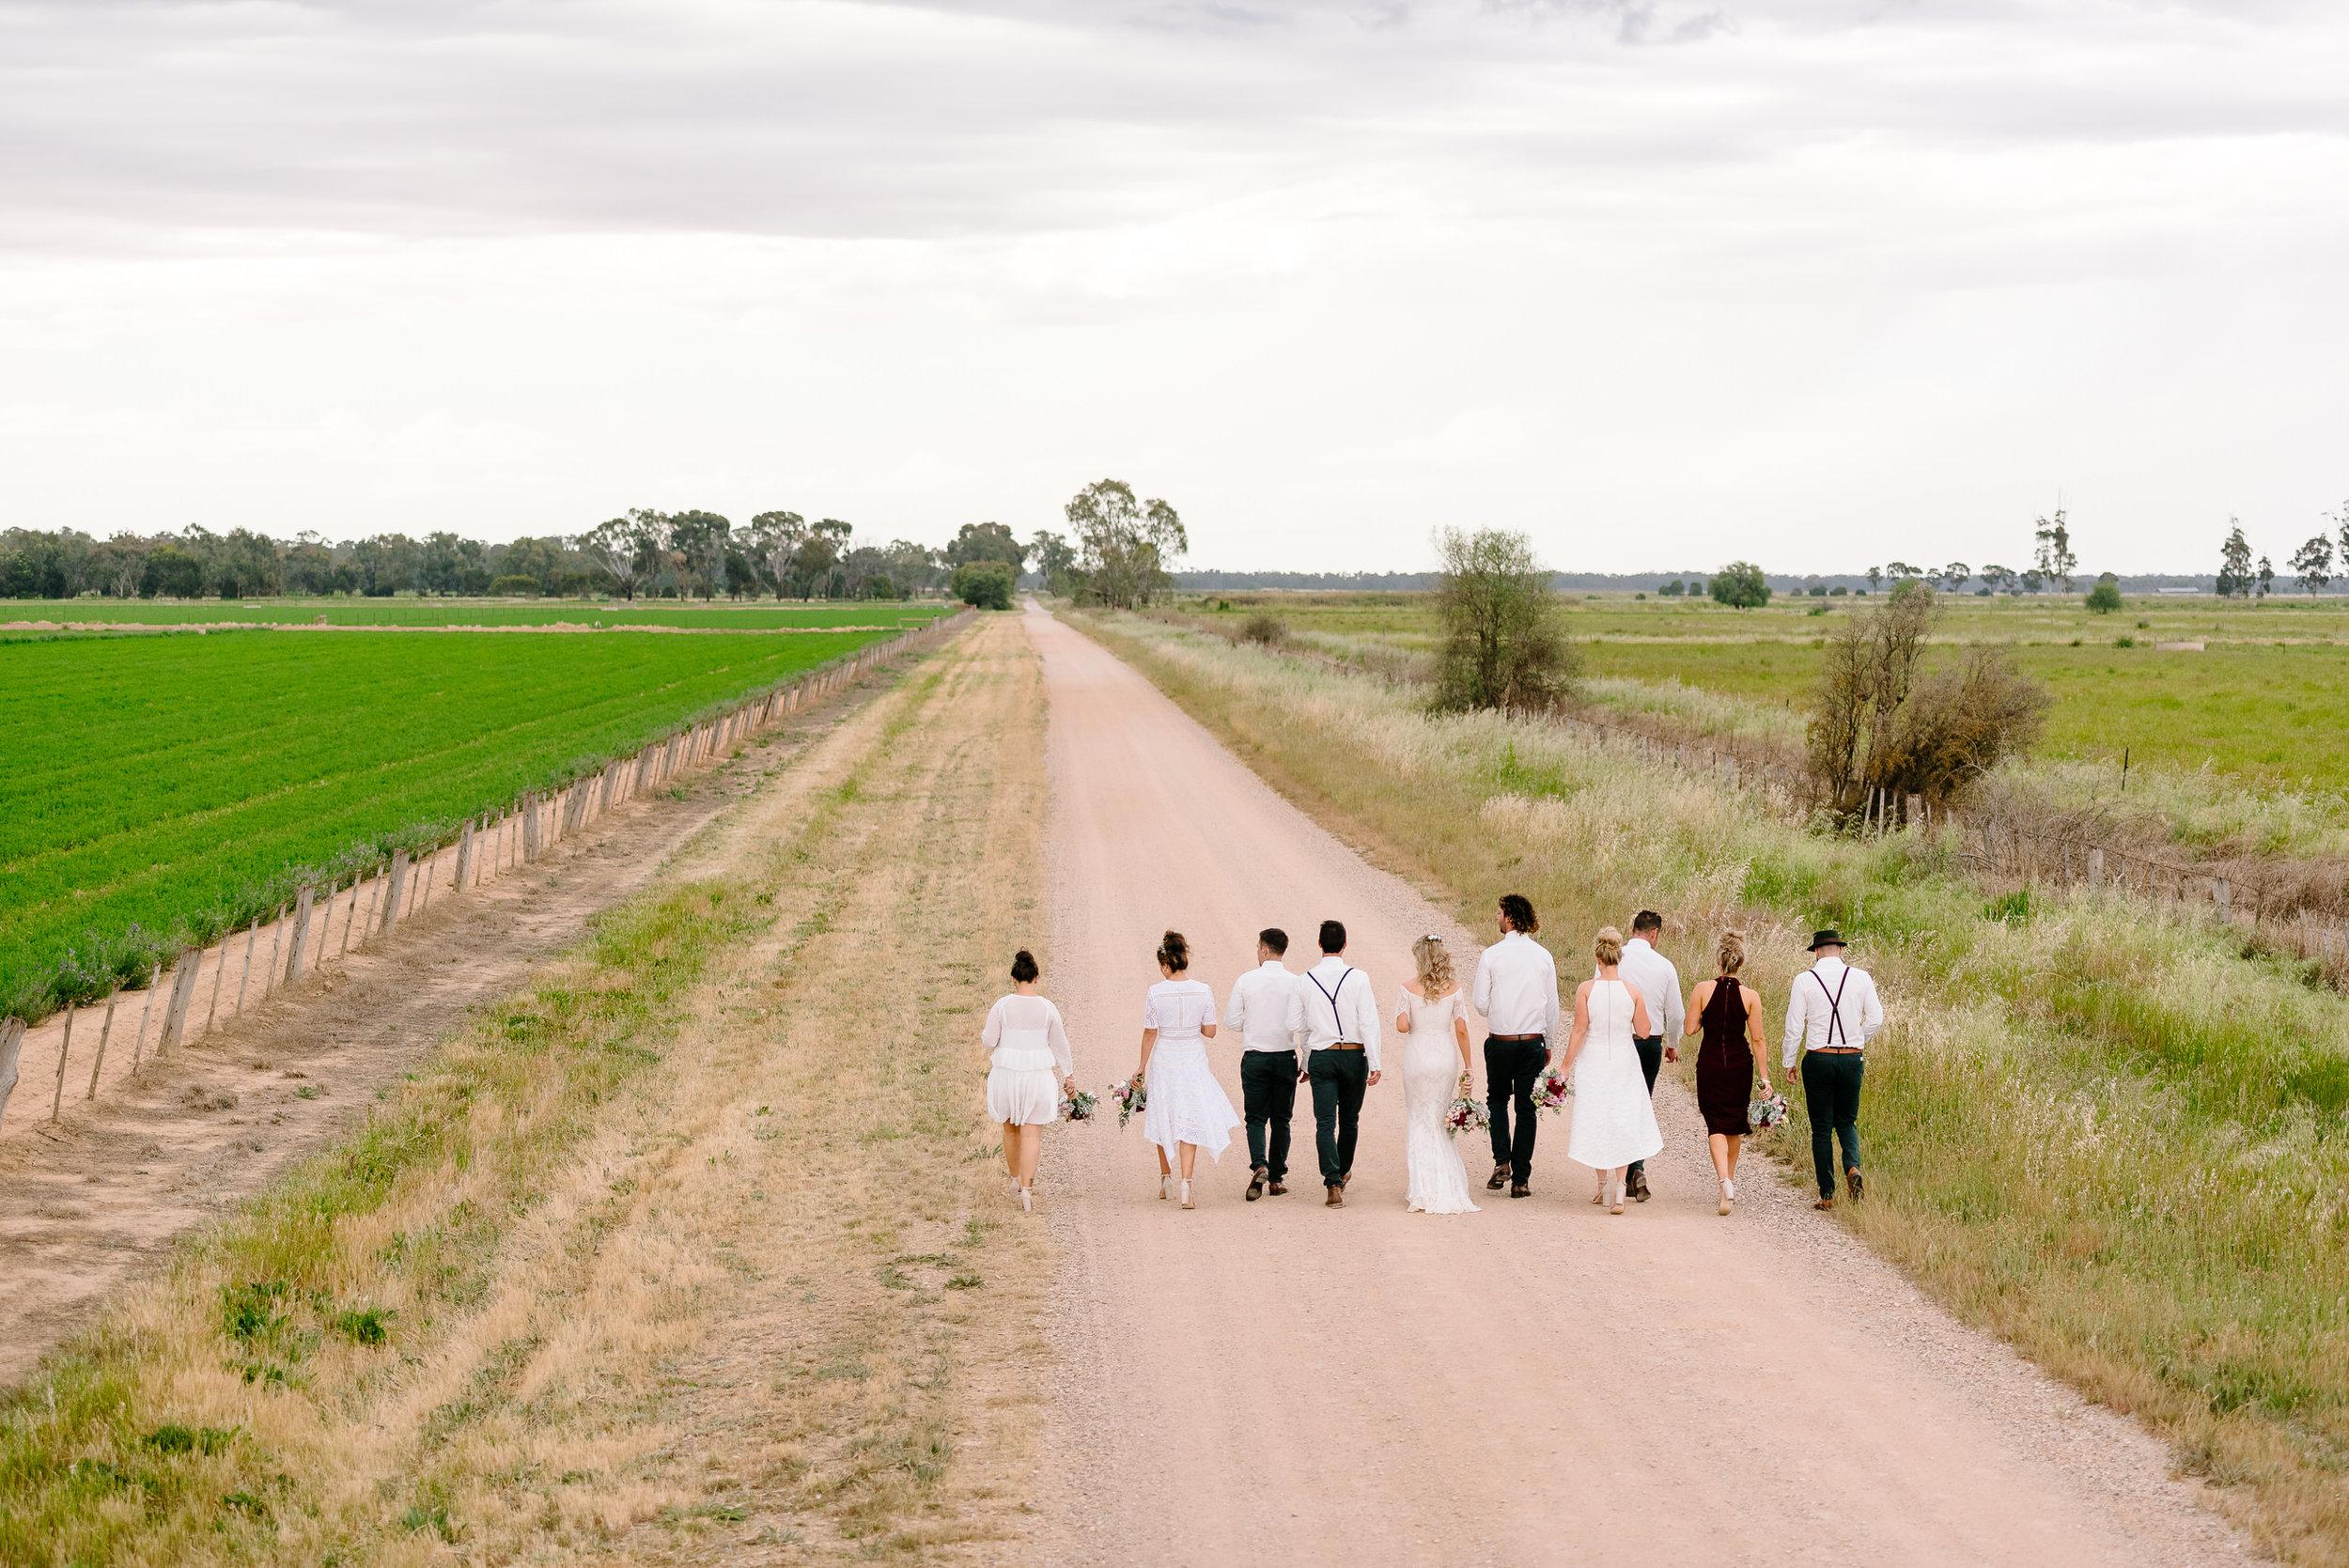 Justin_And_Jim_Photography_Backyard_Wedding194.JPG